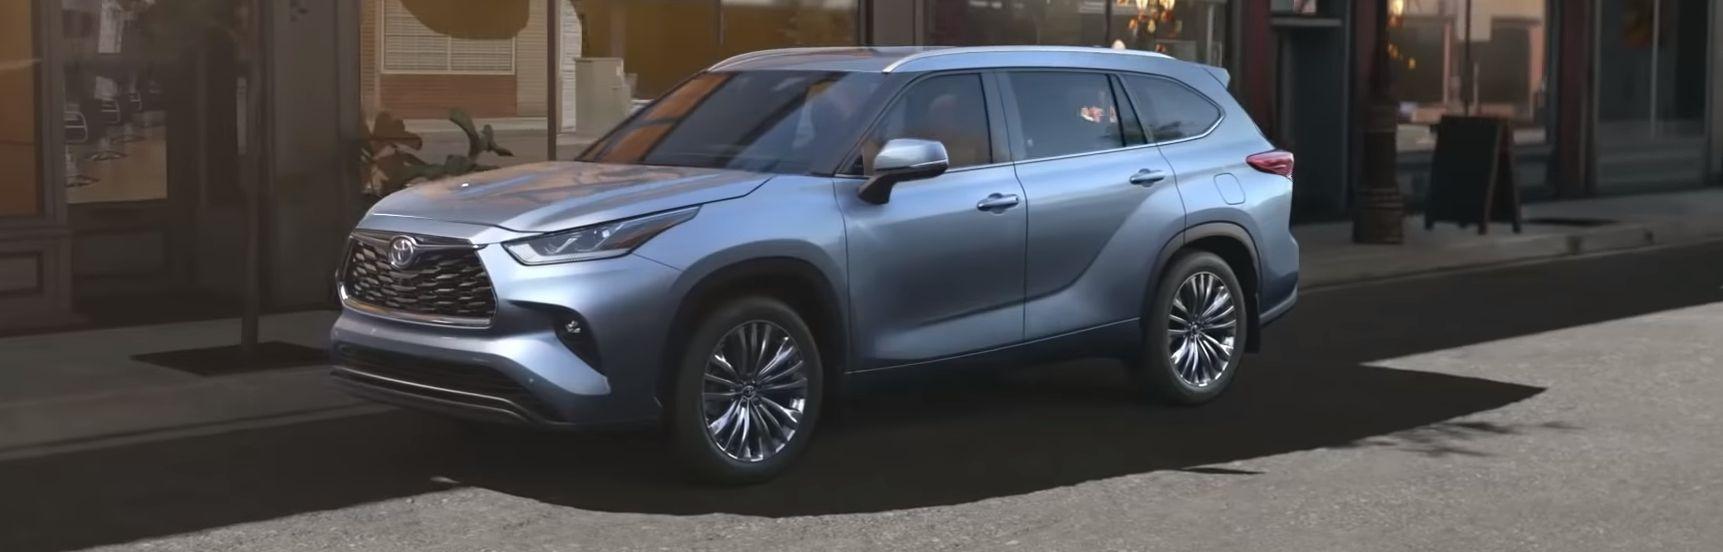 2020 Toyota Highlander Engine Specs Toyota highlander